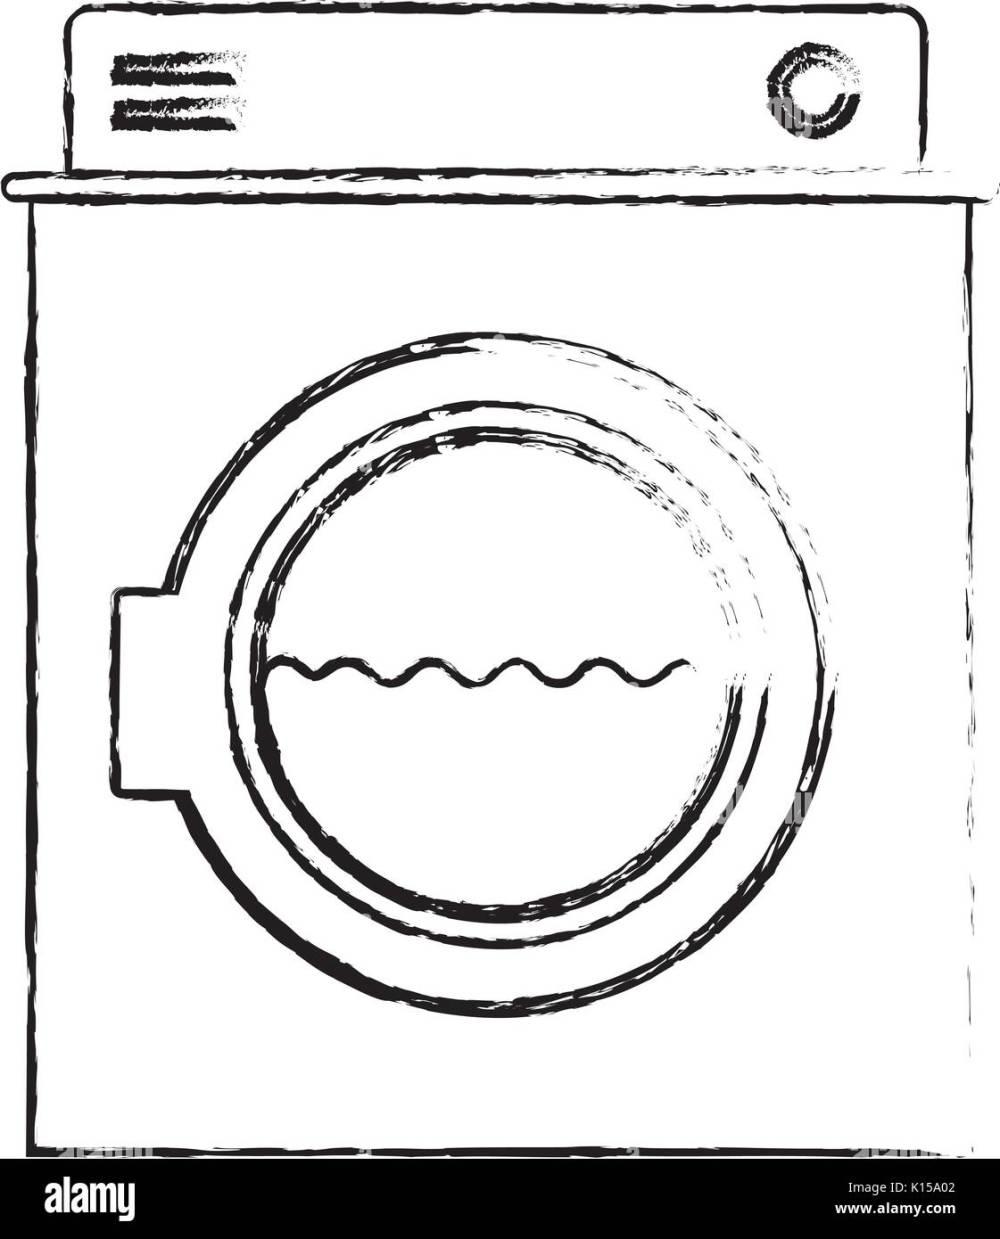 medium resolution of monochrome blurred silhouette of washing machine with water medium level